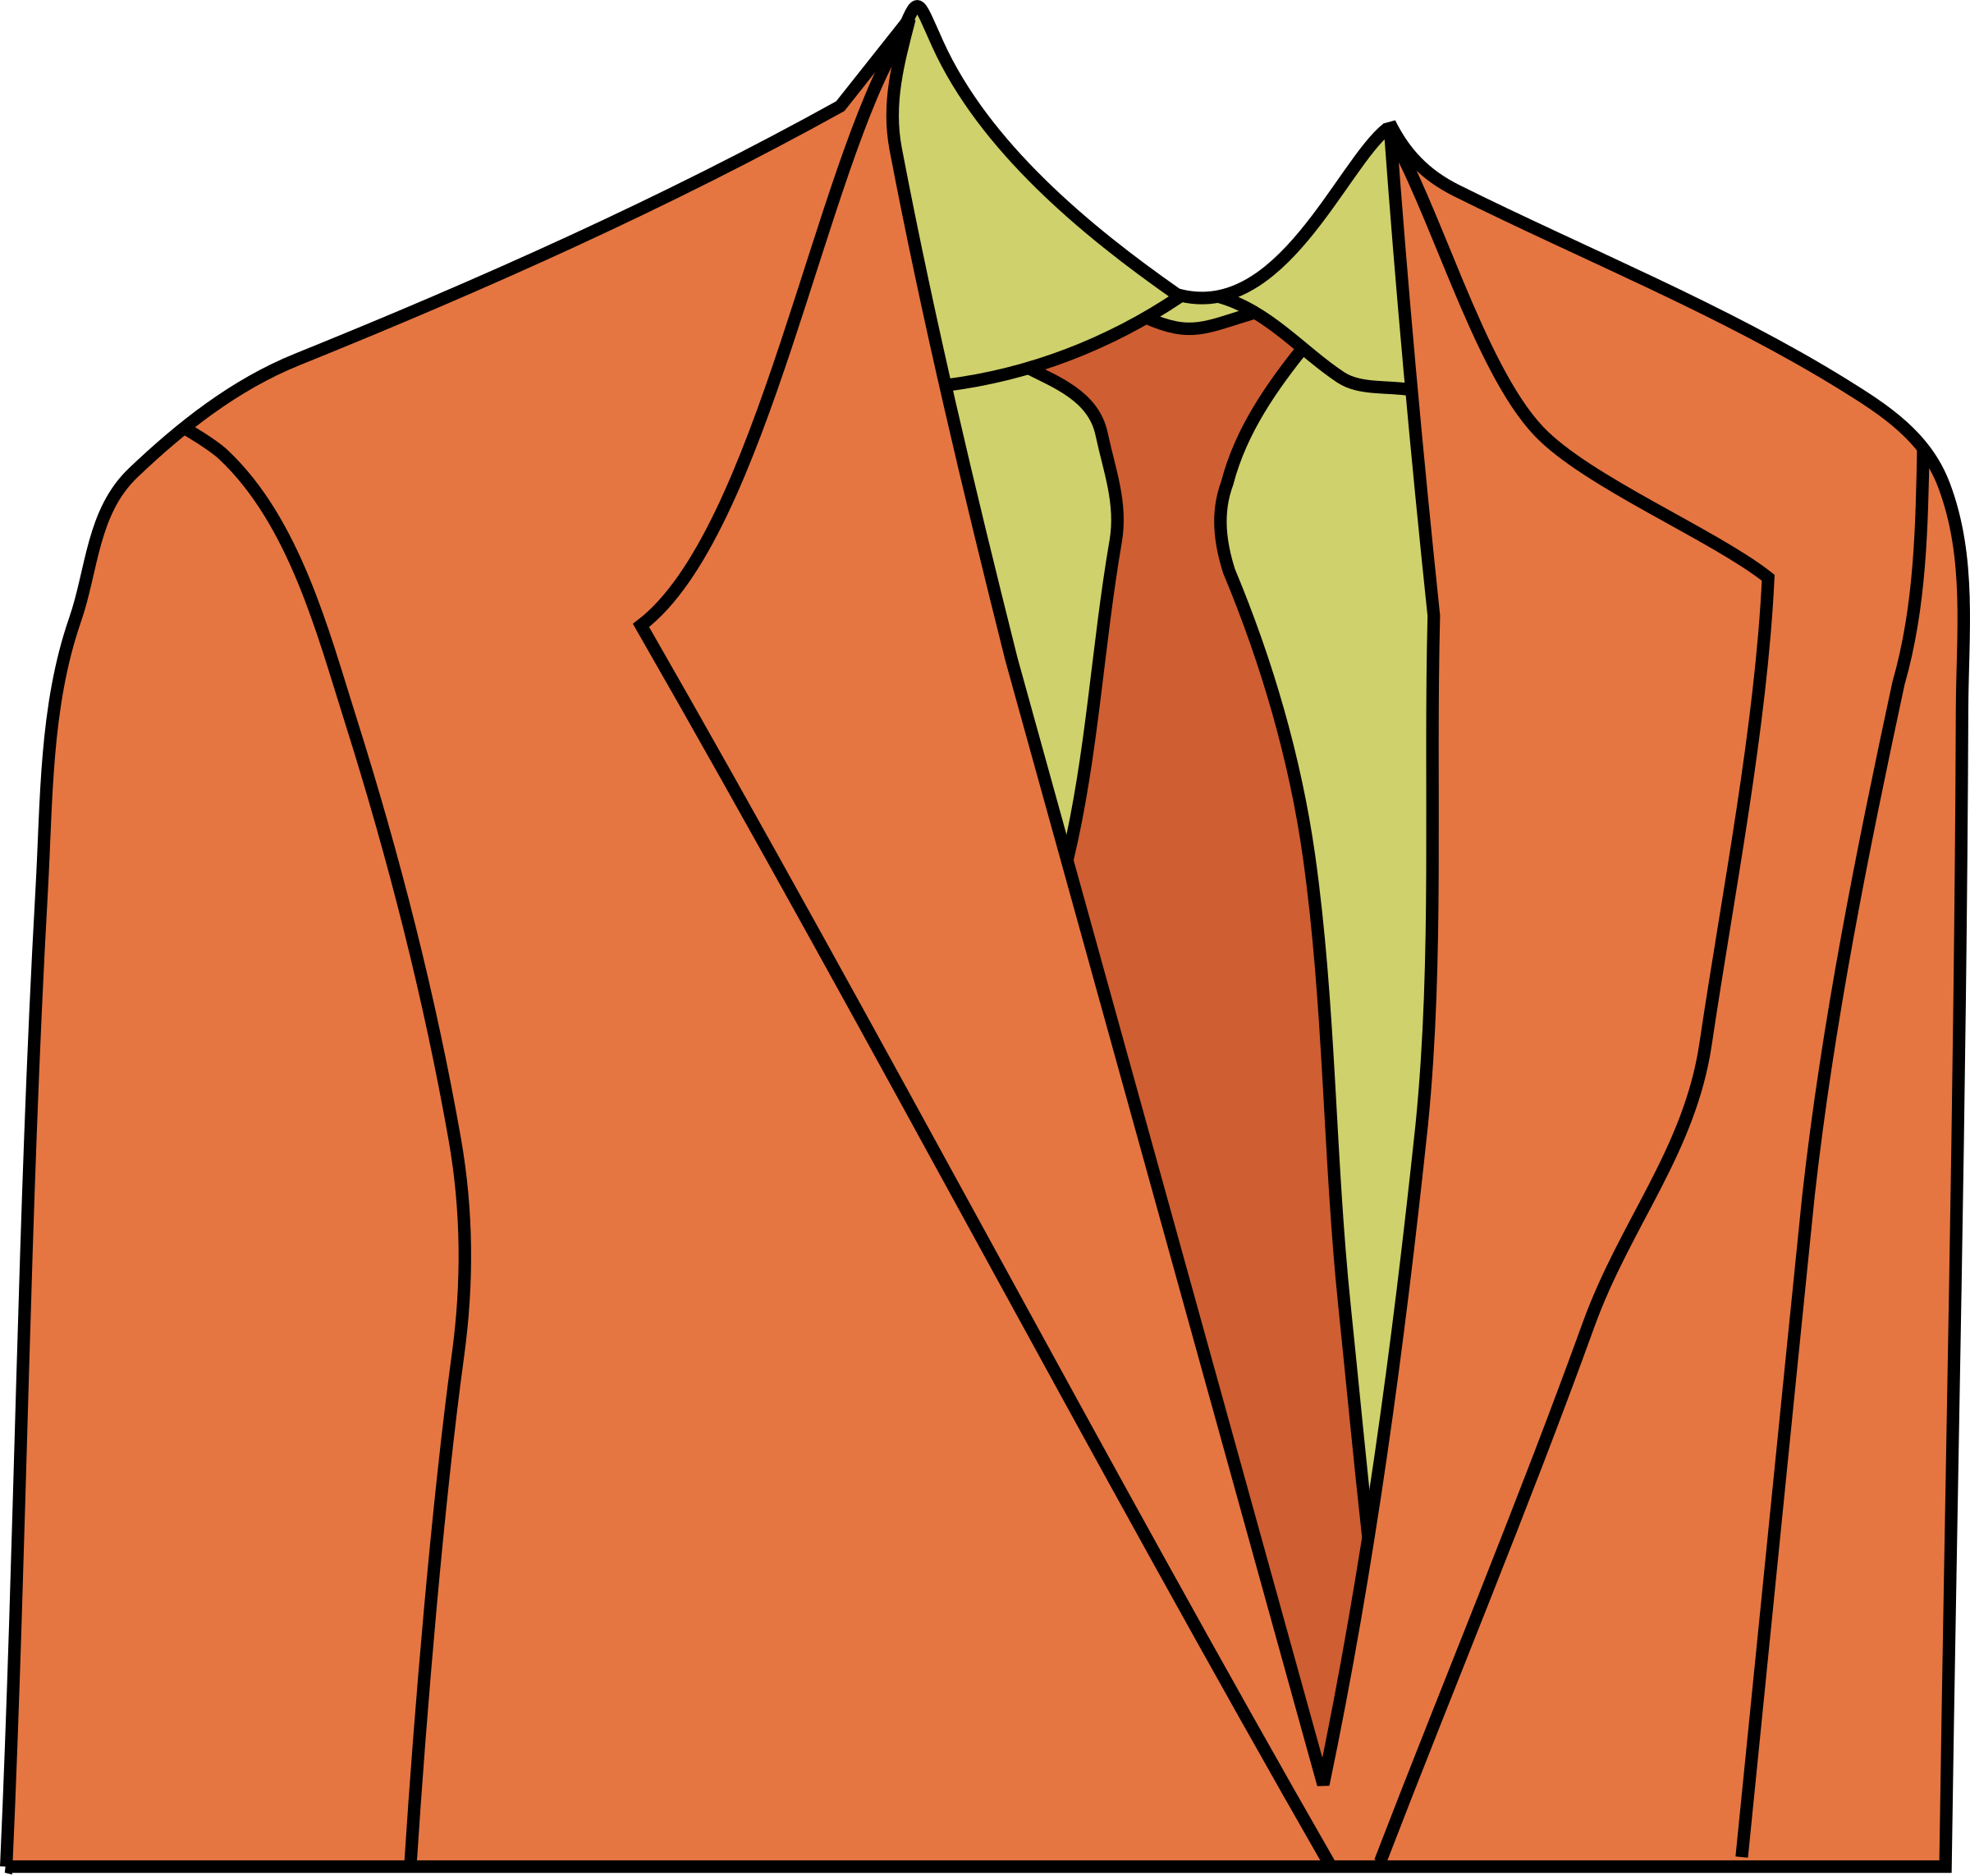 2400x2285 Orange Disco Suit Vector Clipart Image